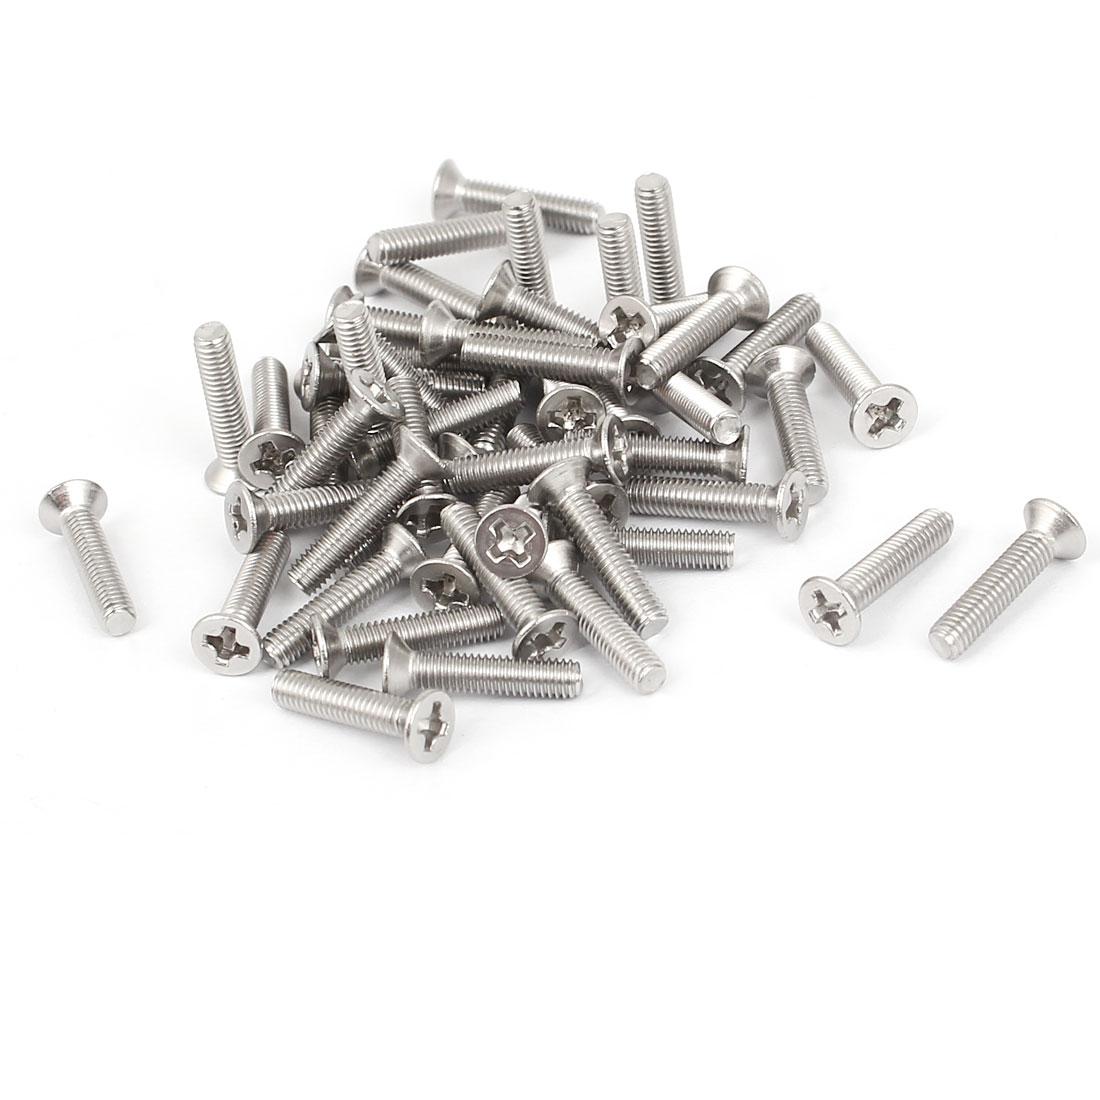 M3x14mm Phillips Flat Countersunk Head Machine Screws Silver Tone 50pcs